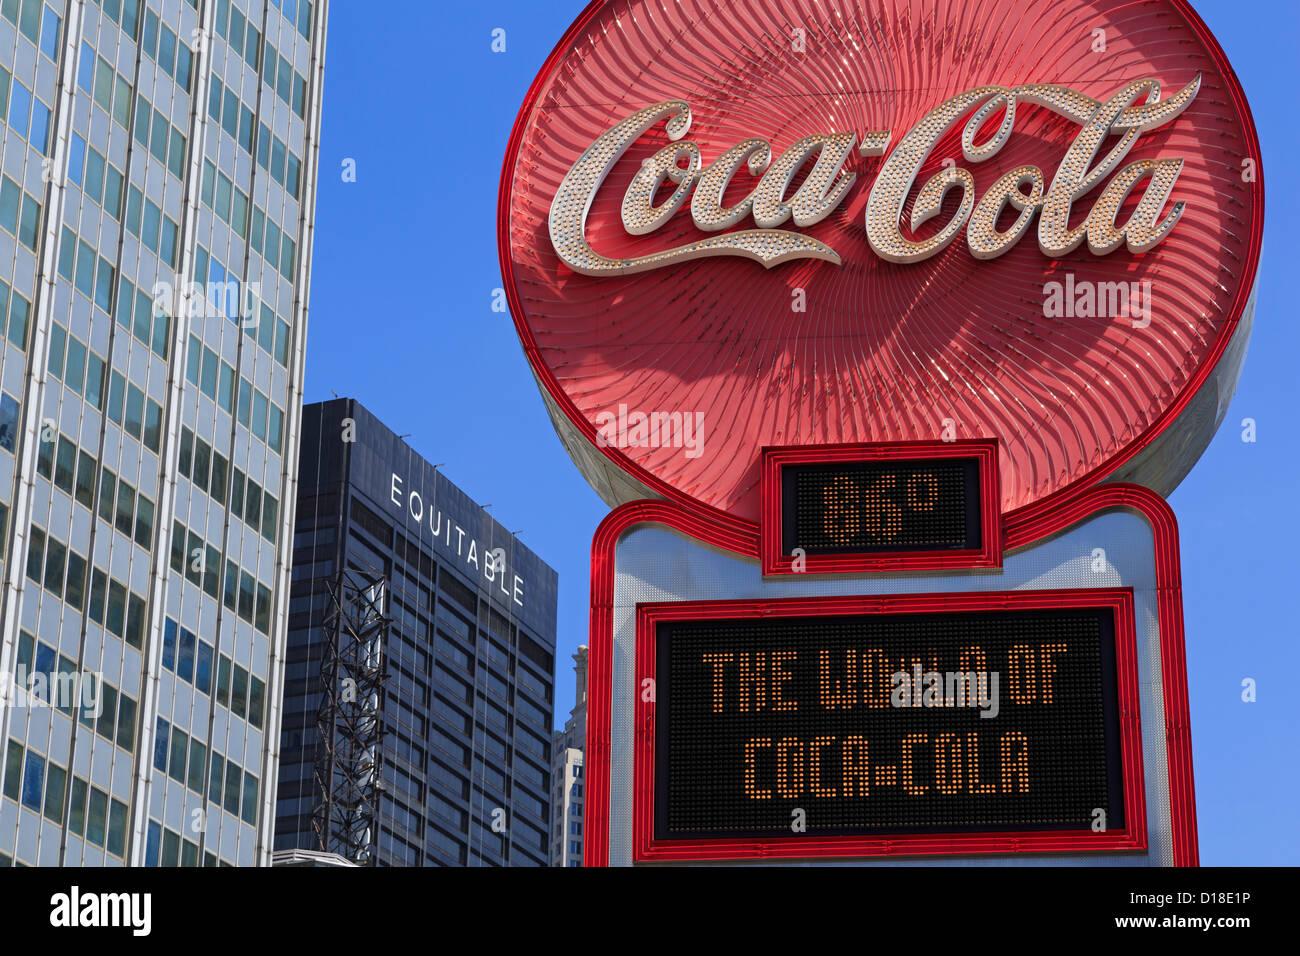 Coca - Cola sign on Peachtree Street,Atlanta,Georgia,USA - Stock Image